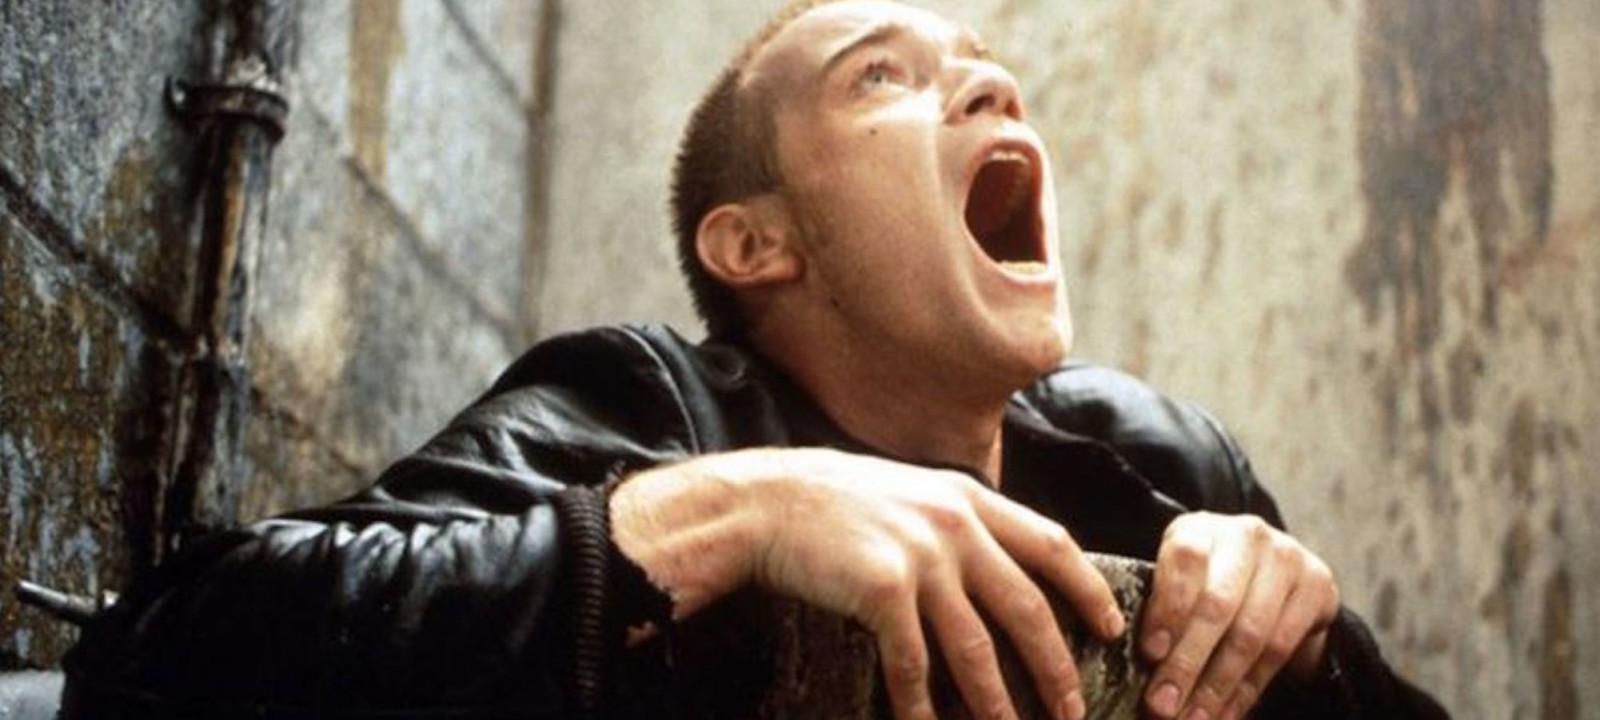 Ewan McGregor as Renton in 'Trainspotting'